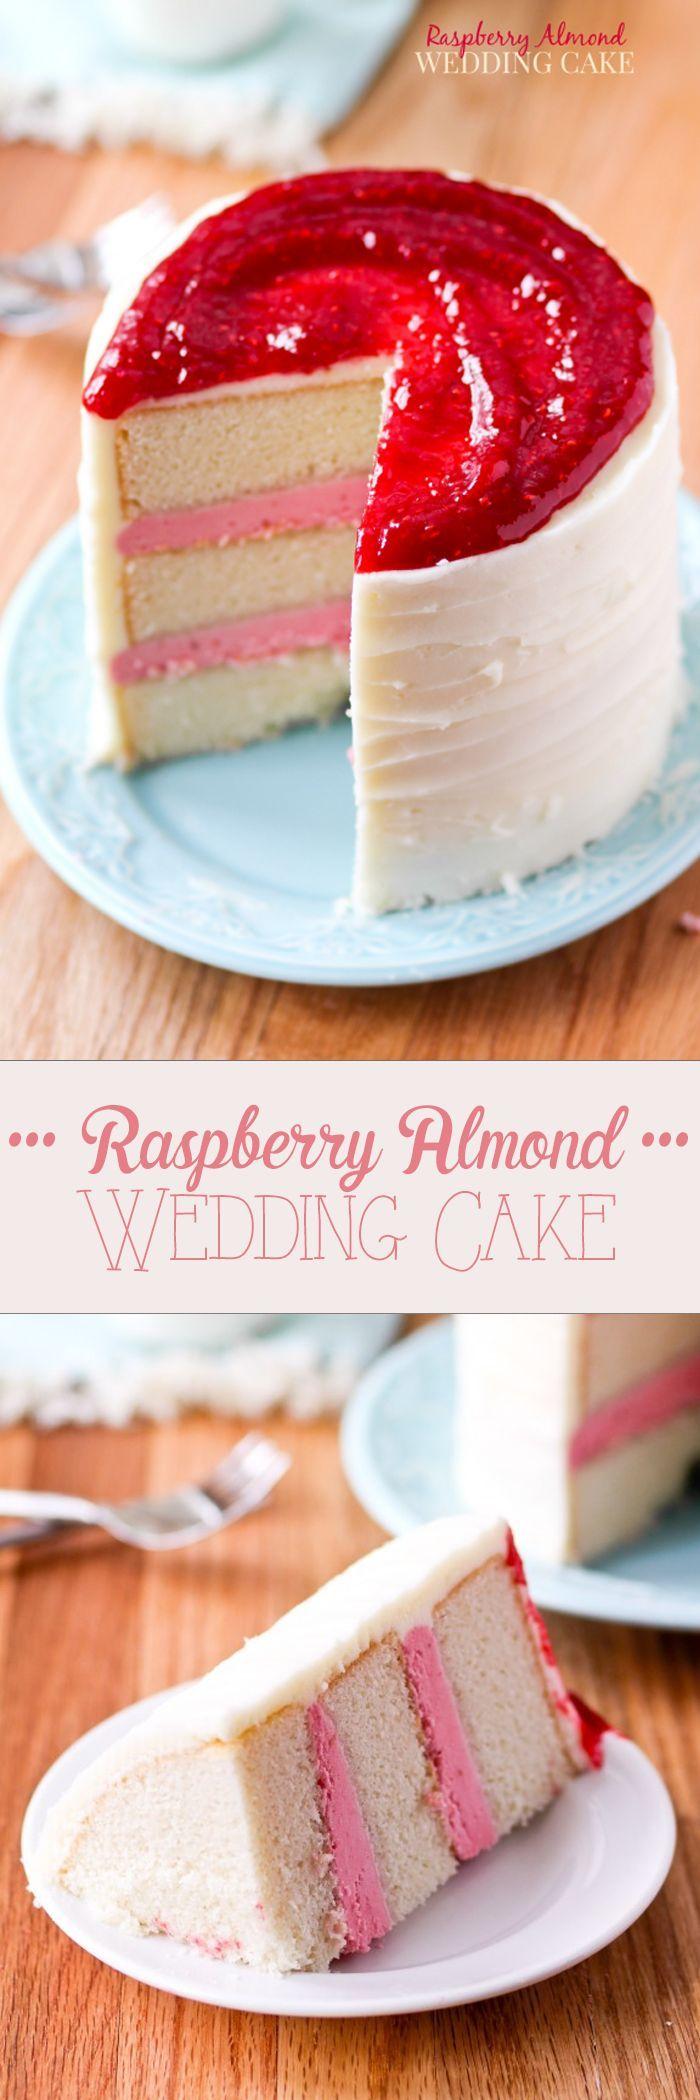 RASPBERRY ALMOND WEDDING CAKE Easily The Best Cake Ive Ever Eaten